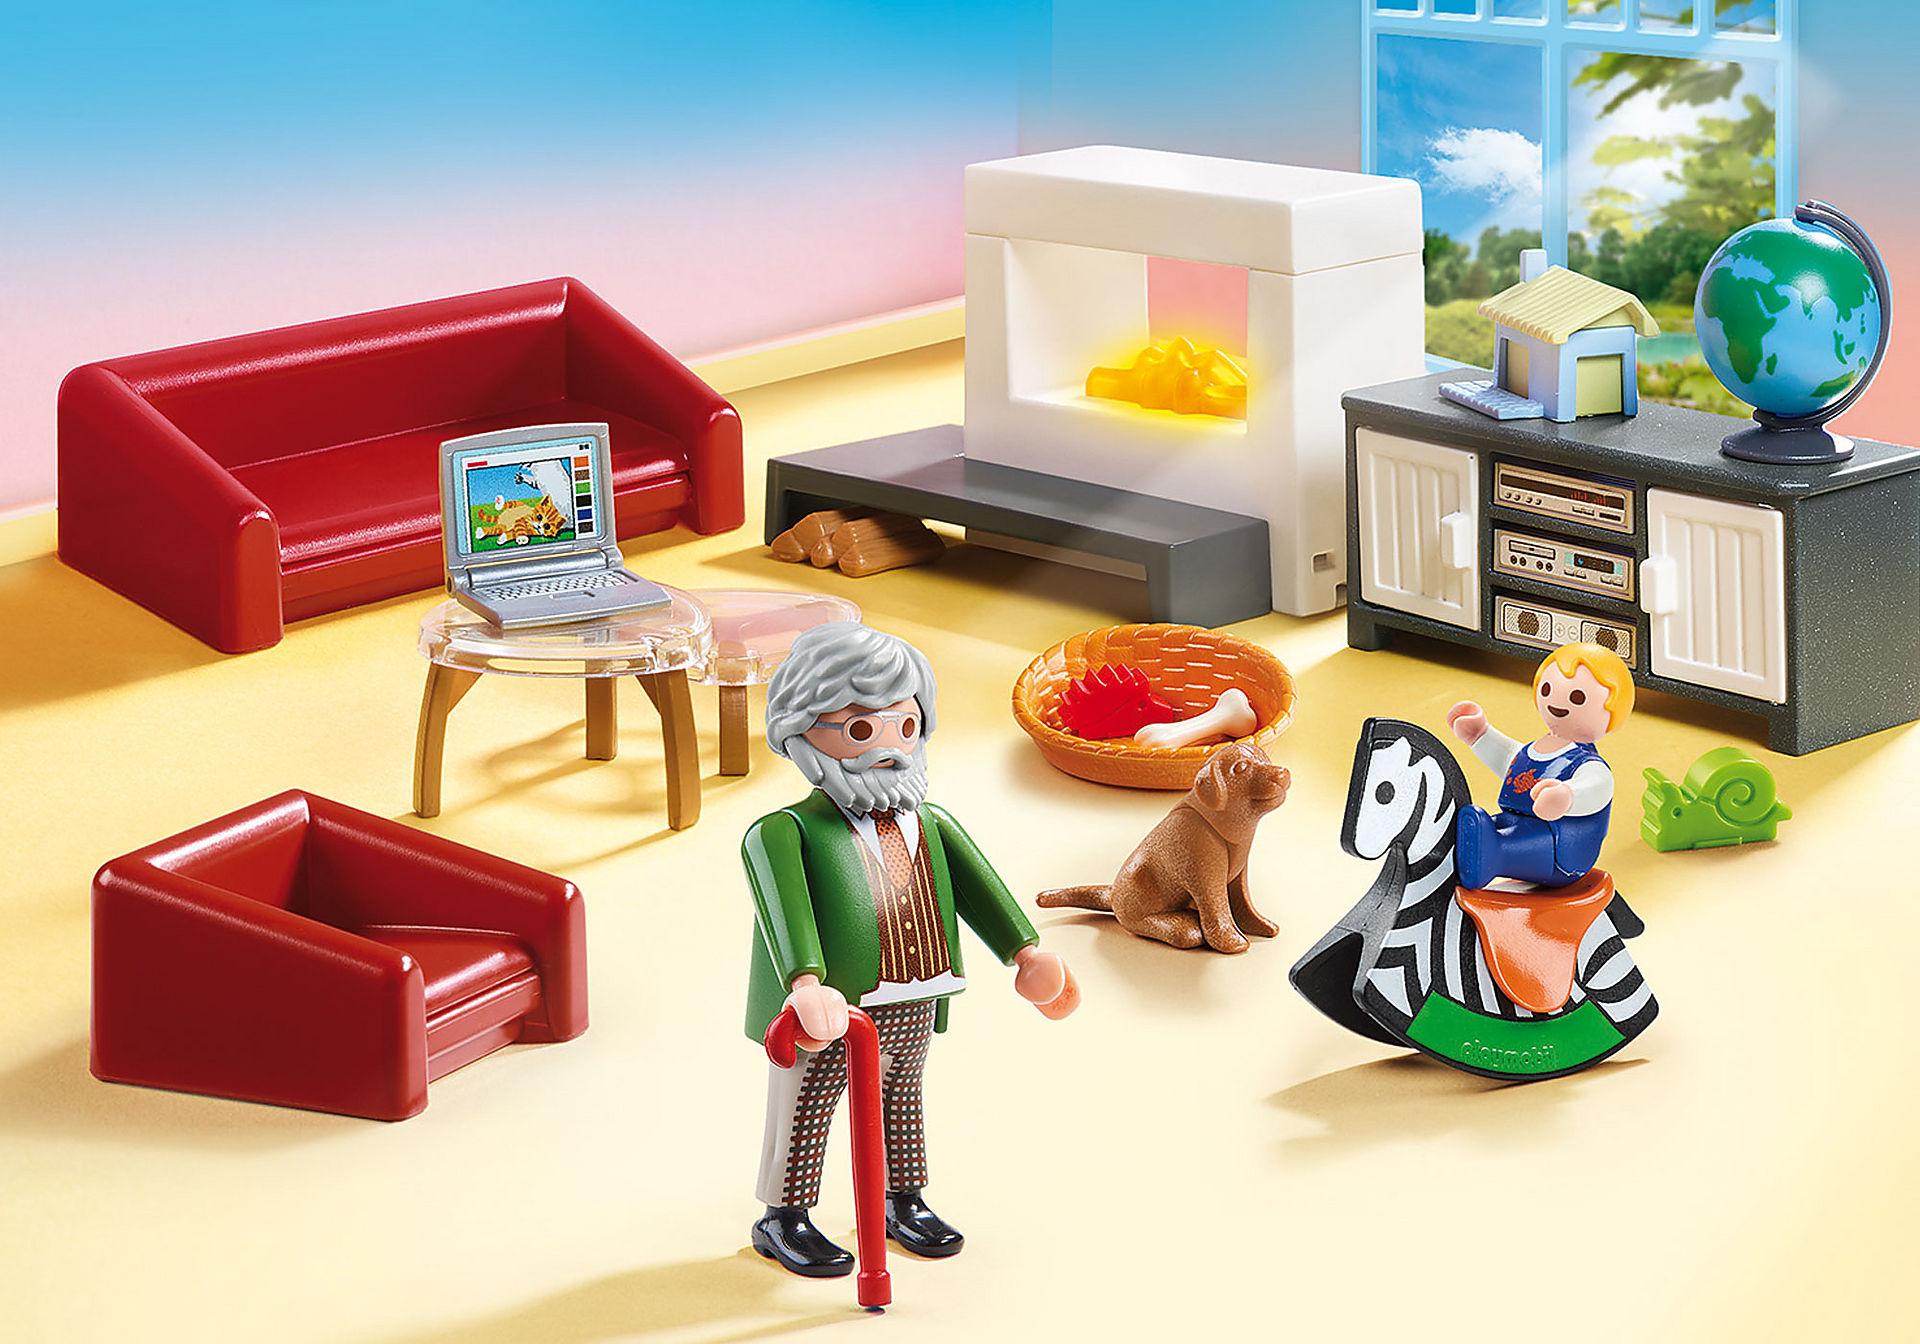 http://media.playmobil.com/i/playmobil/70207_product_detail/Soggiorno con camino